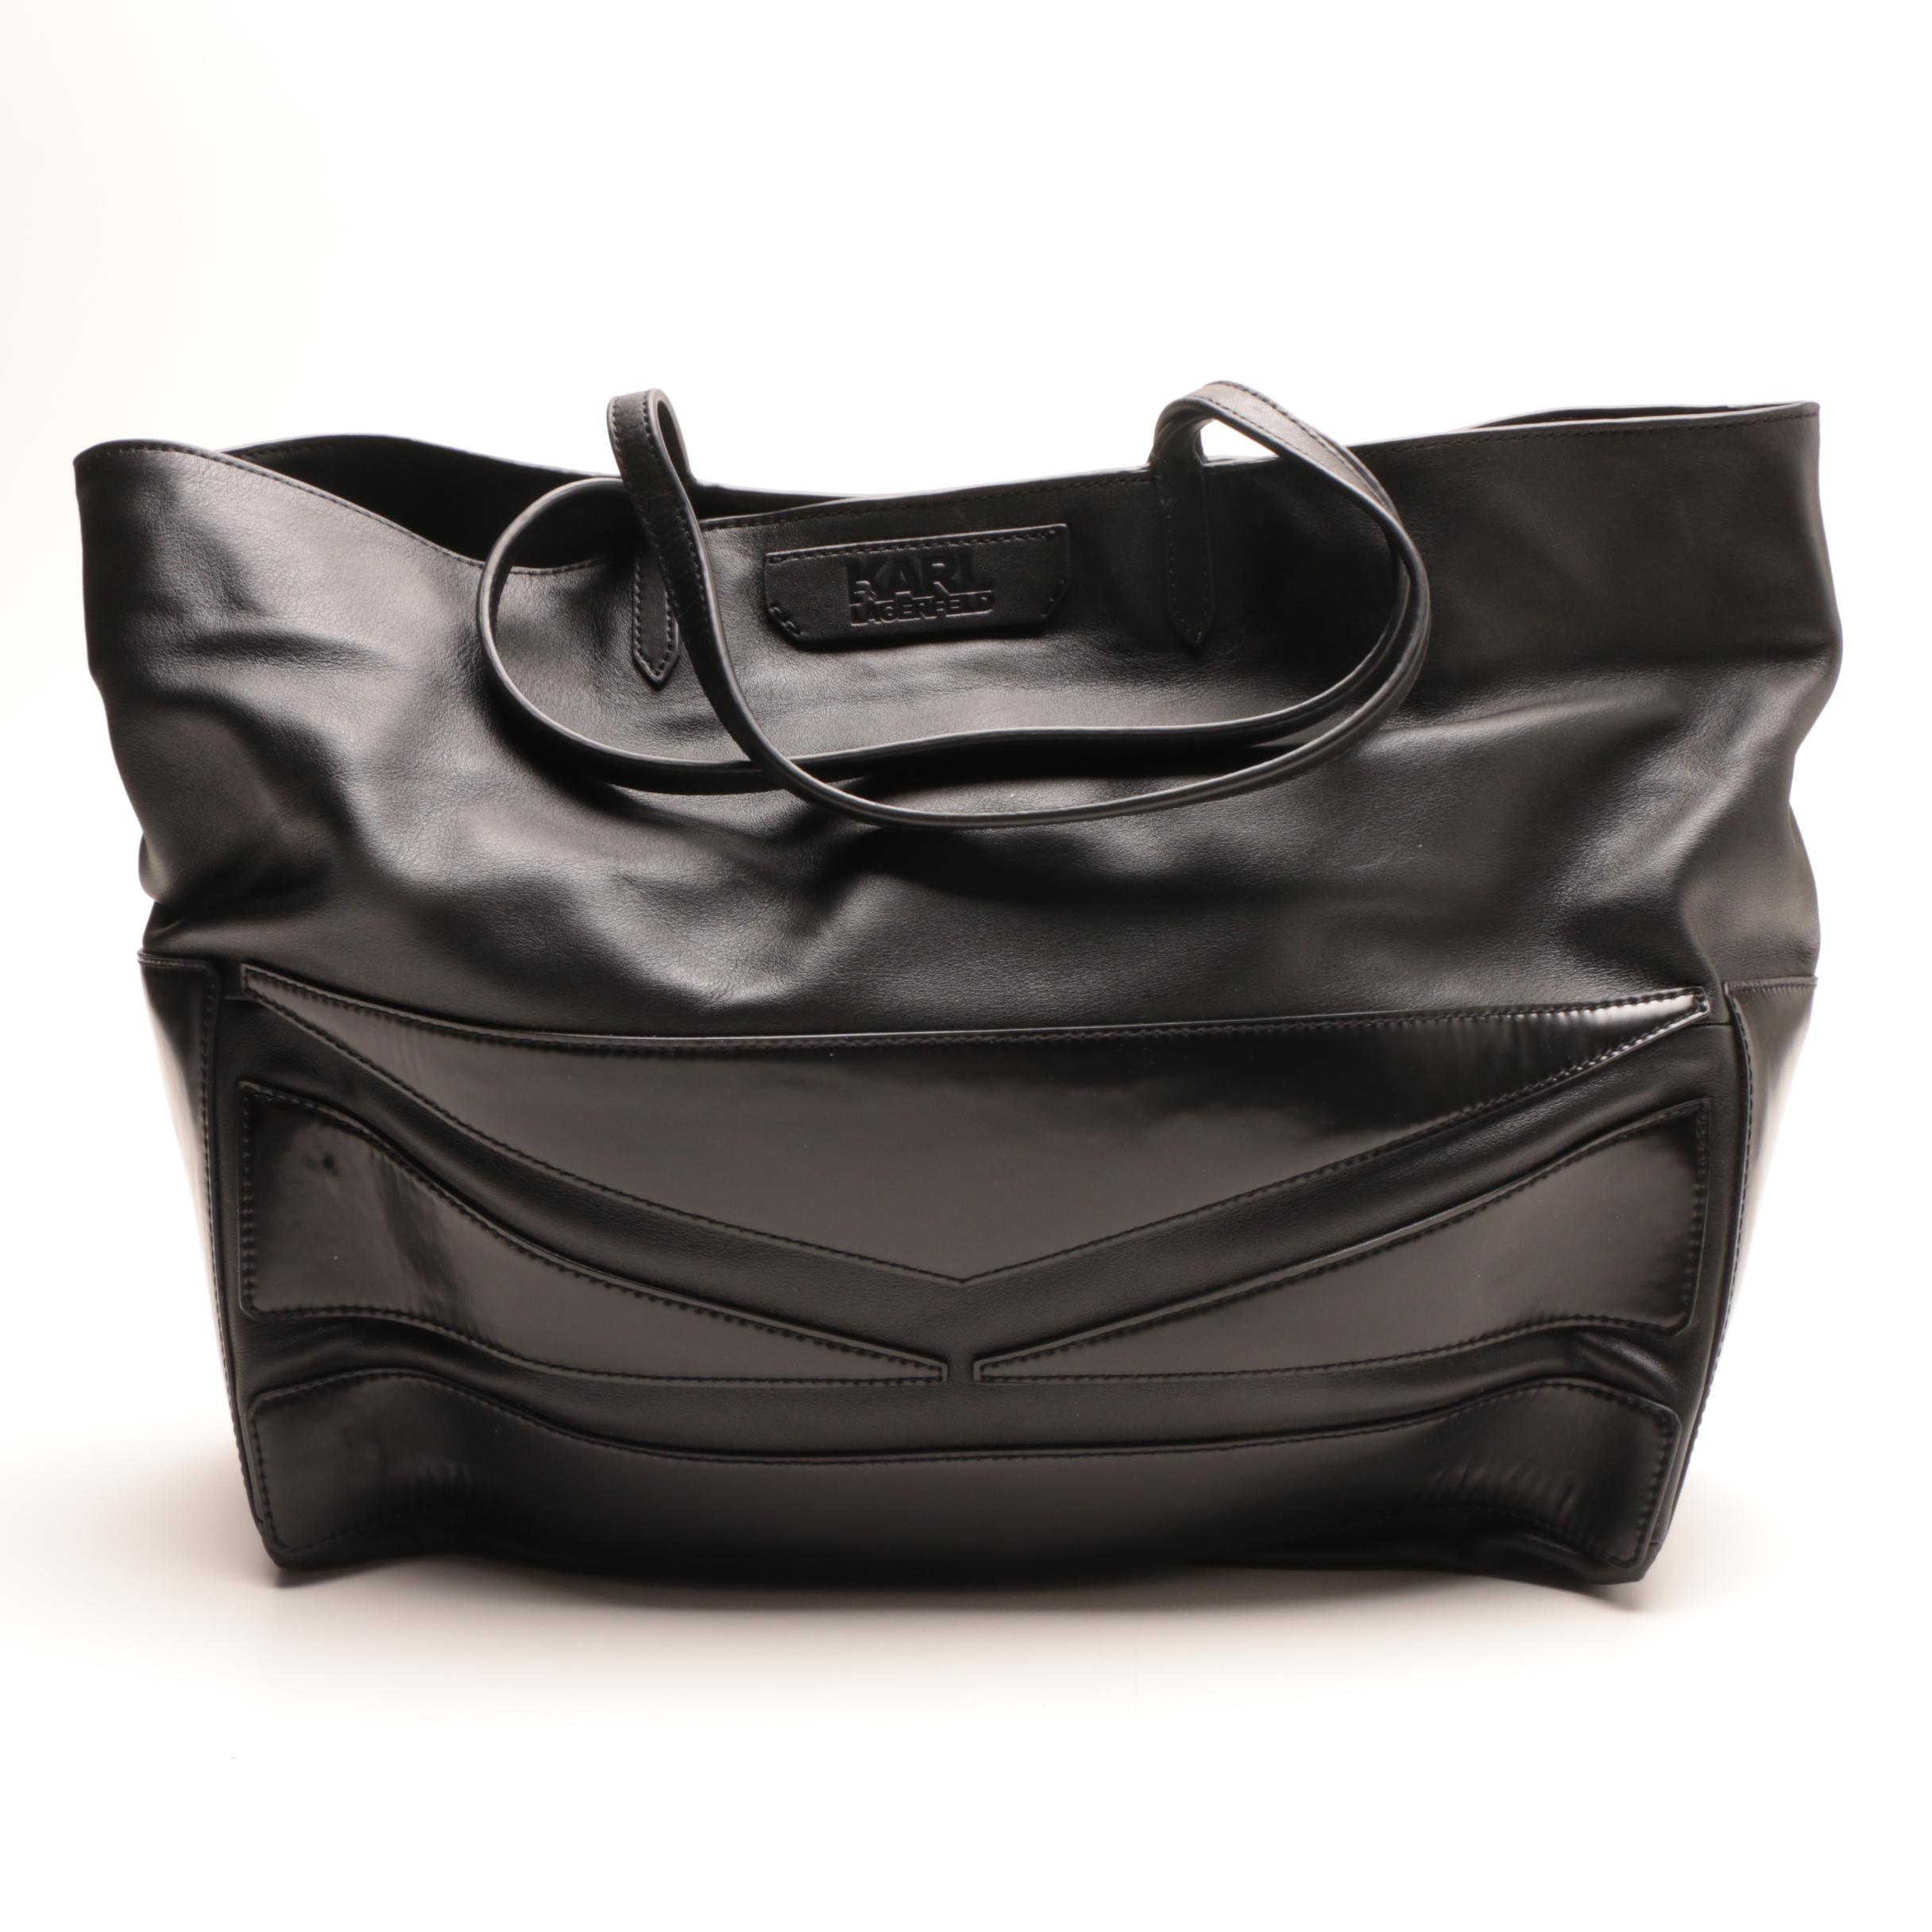 Karl Lagerfeld Black Leather Tote Bag